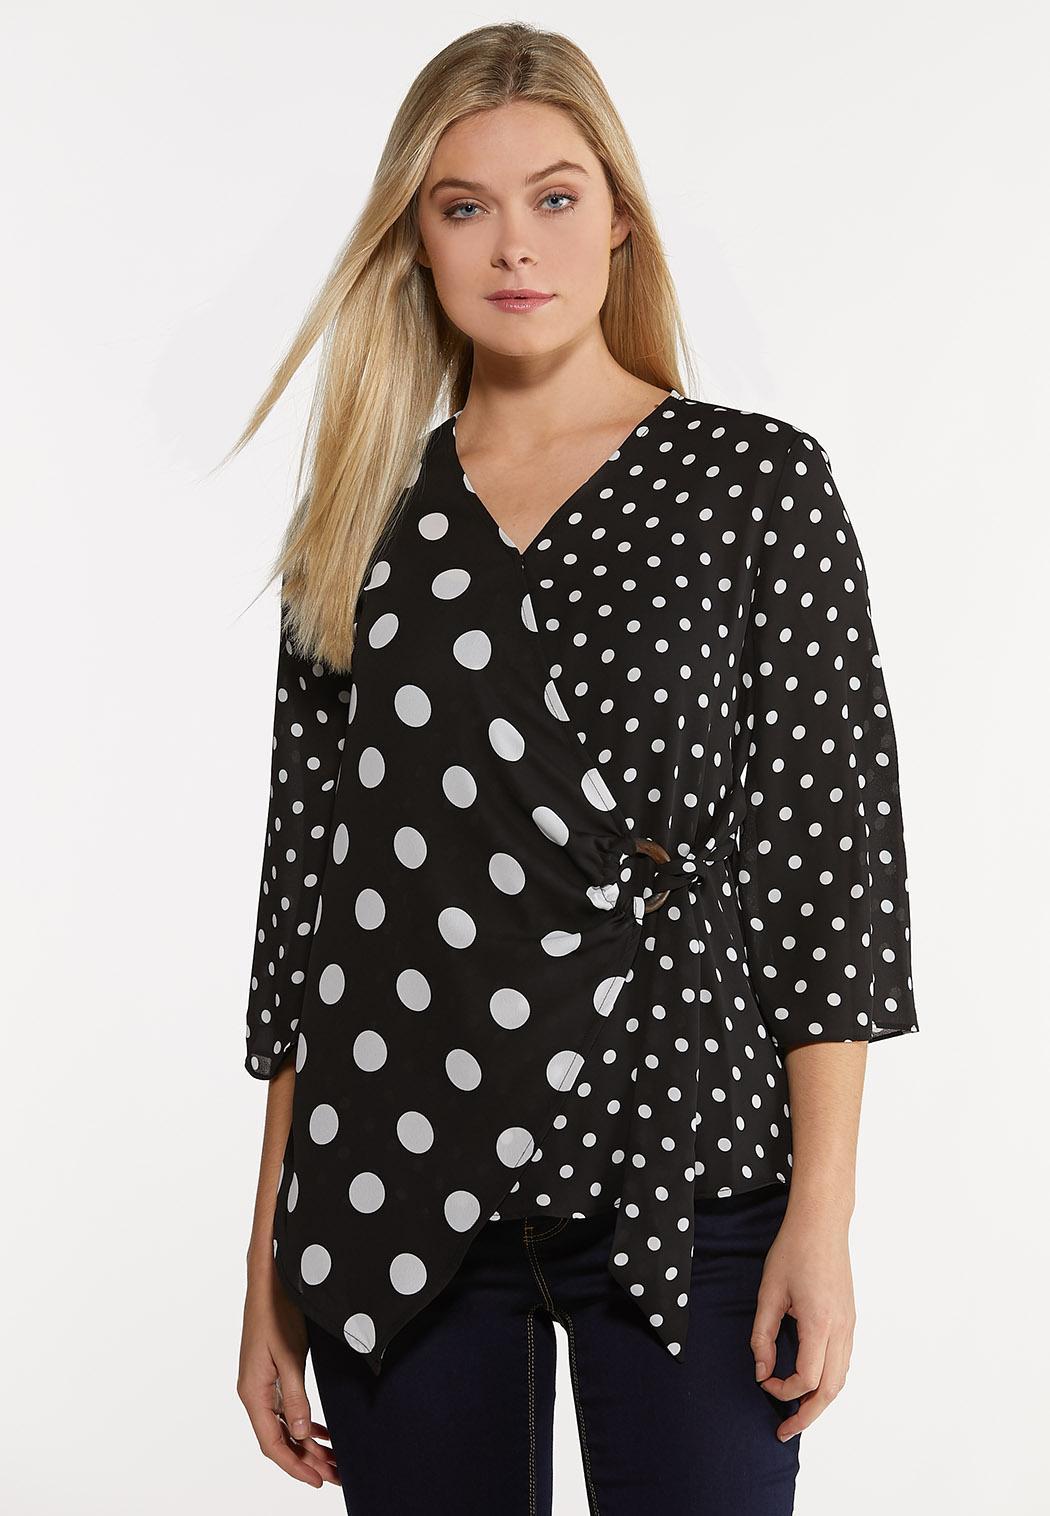 Plus Size Black And White Polka Dot Shirt